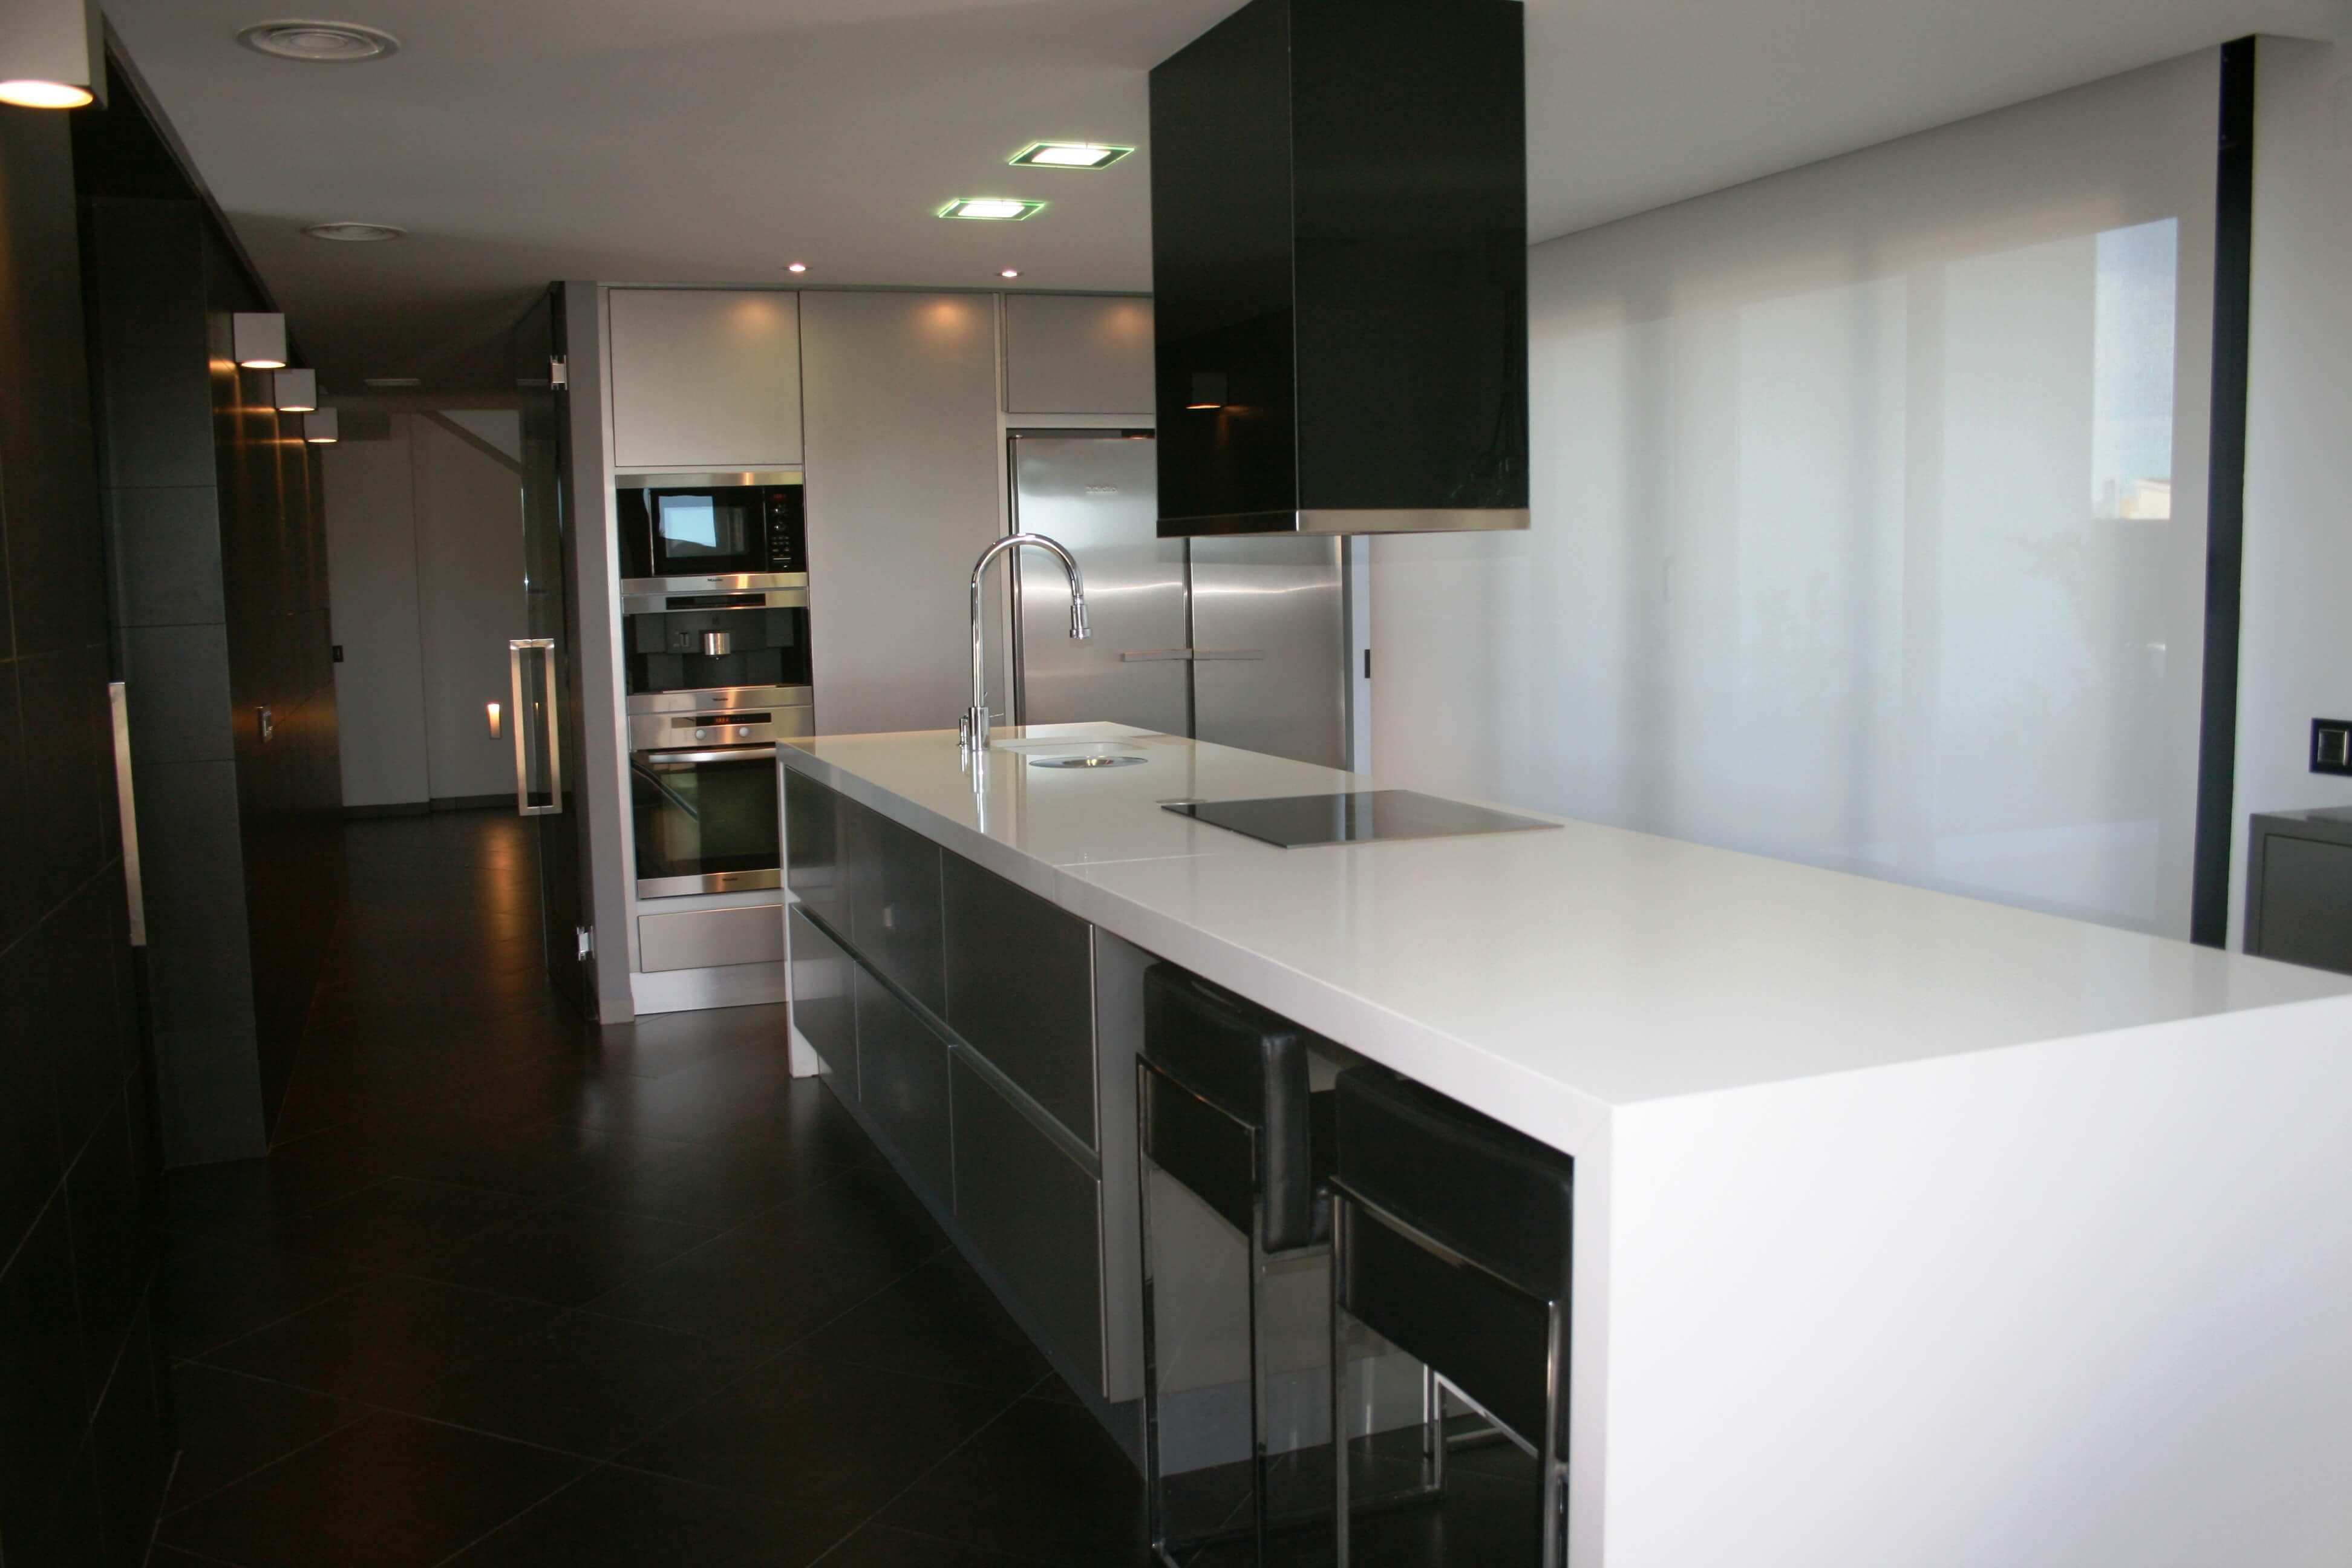 arkitech-categoria-residencial-13